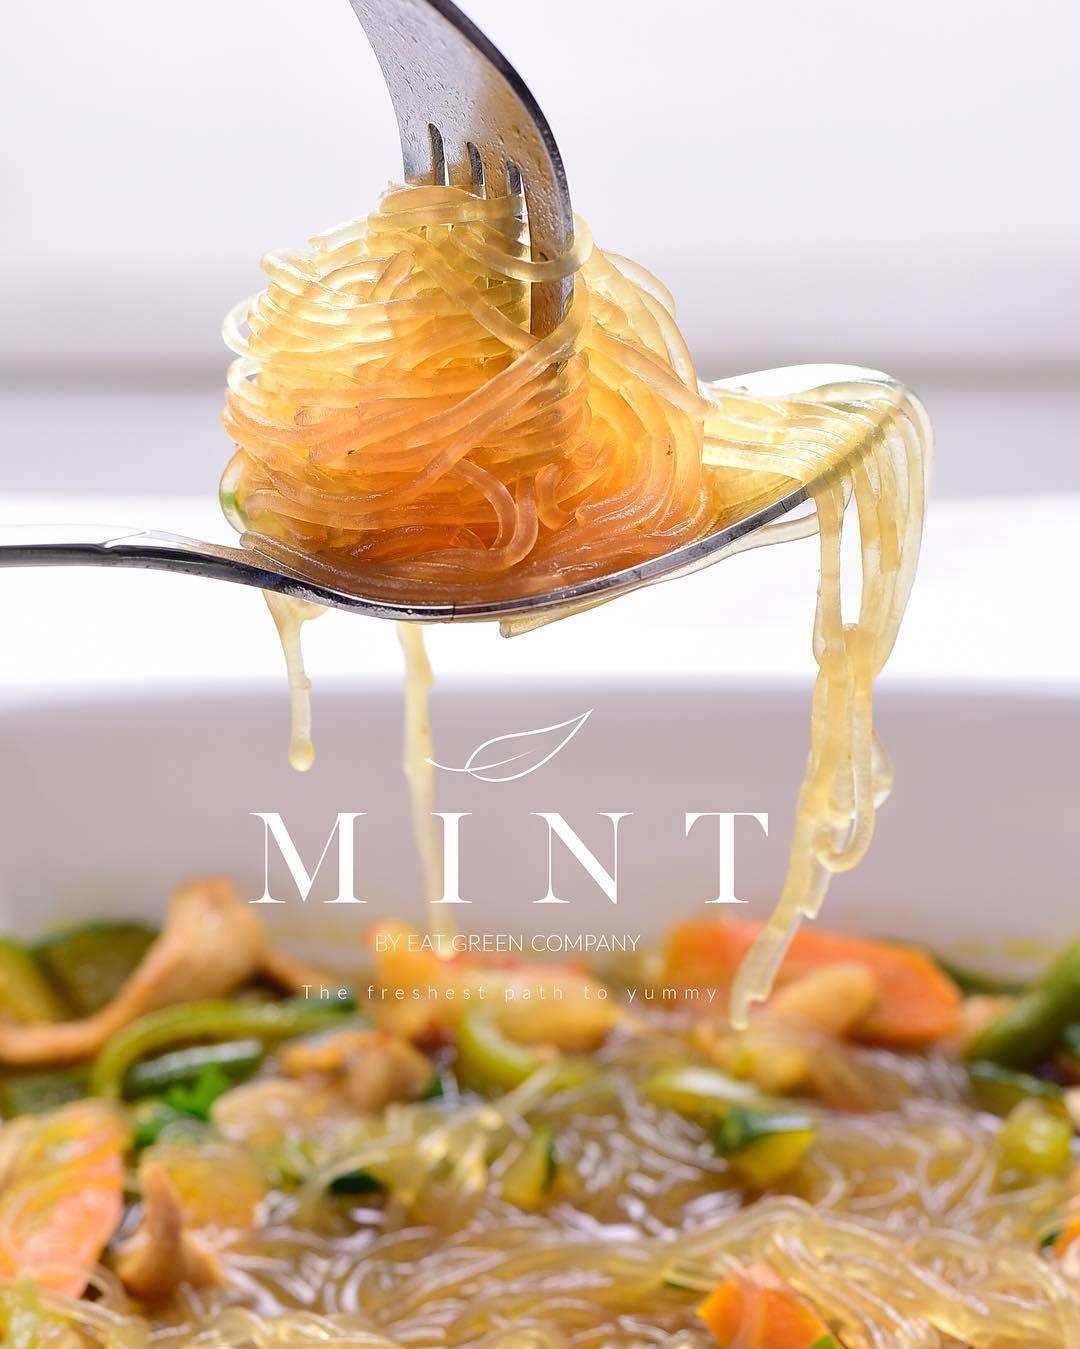 Mint Restaurant